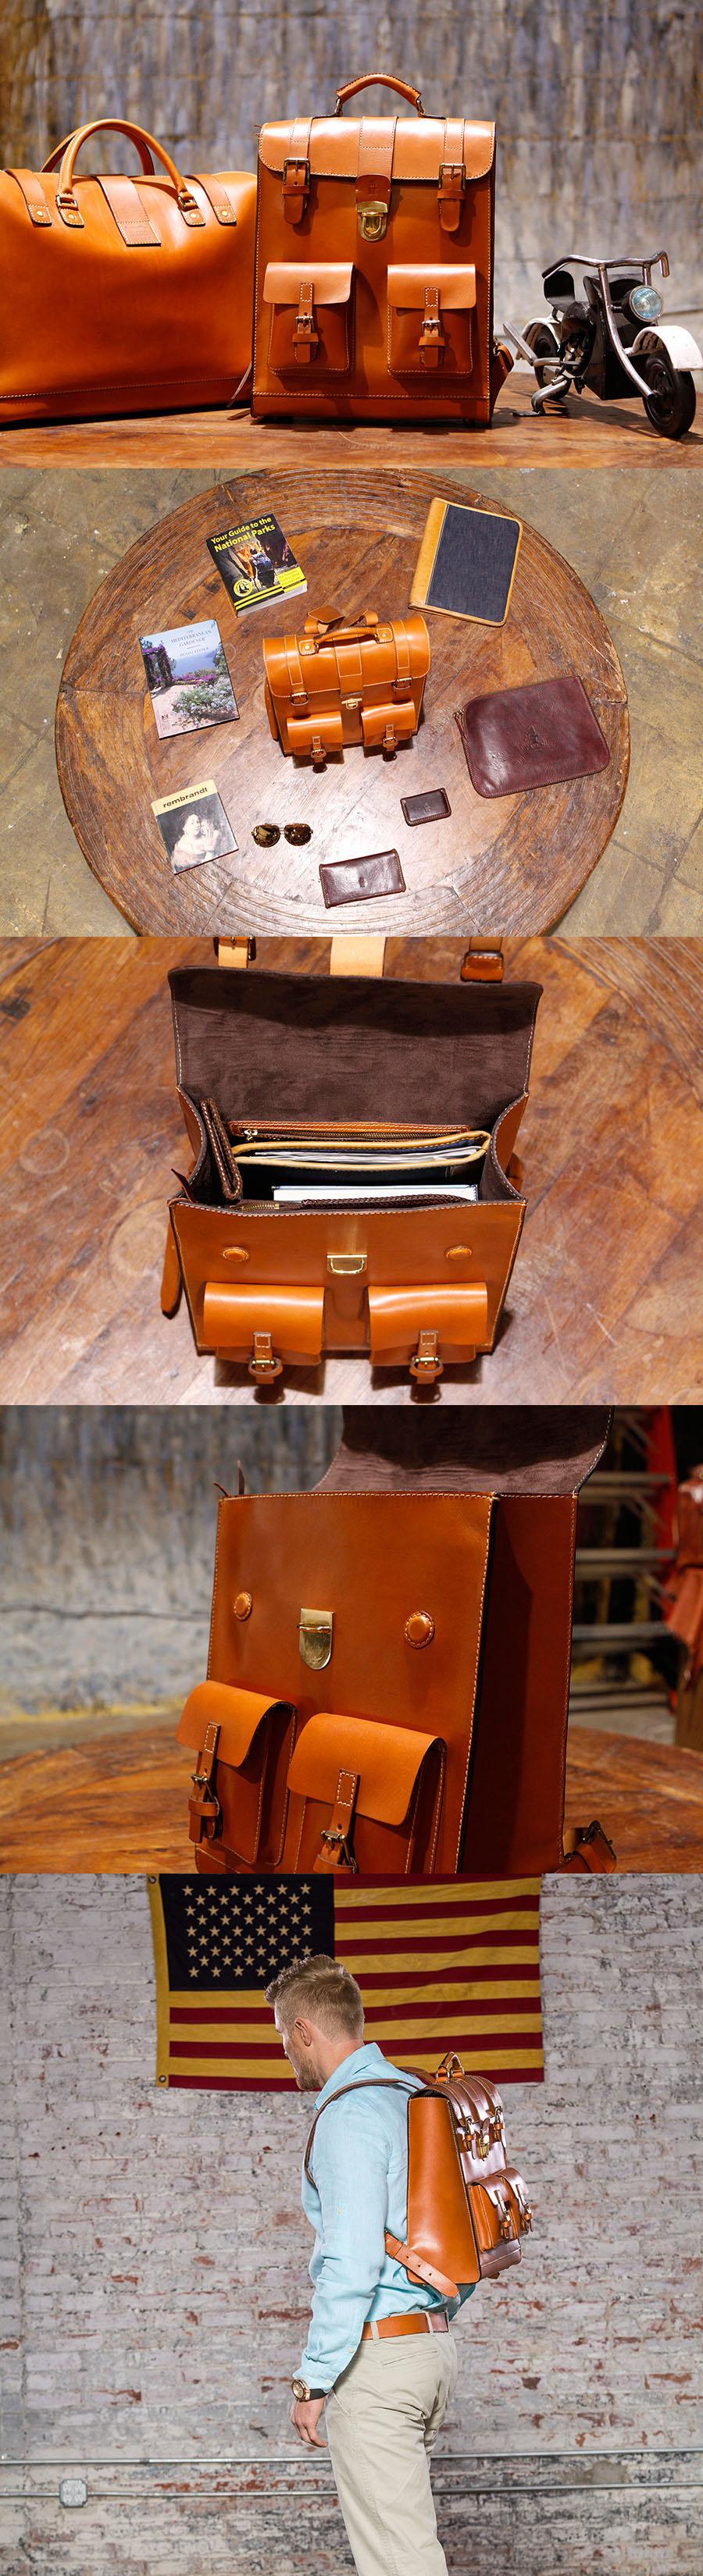 francisbackpack